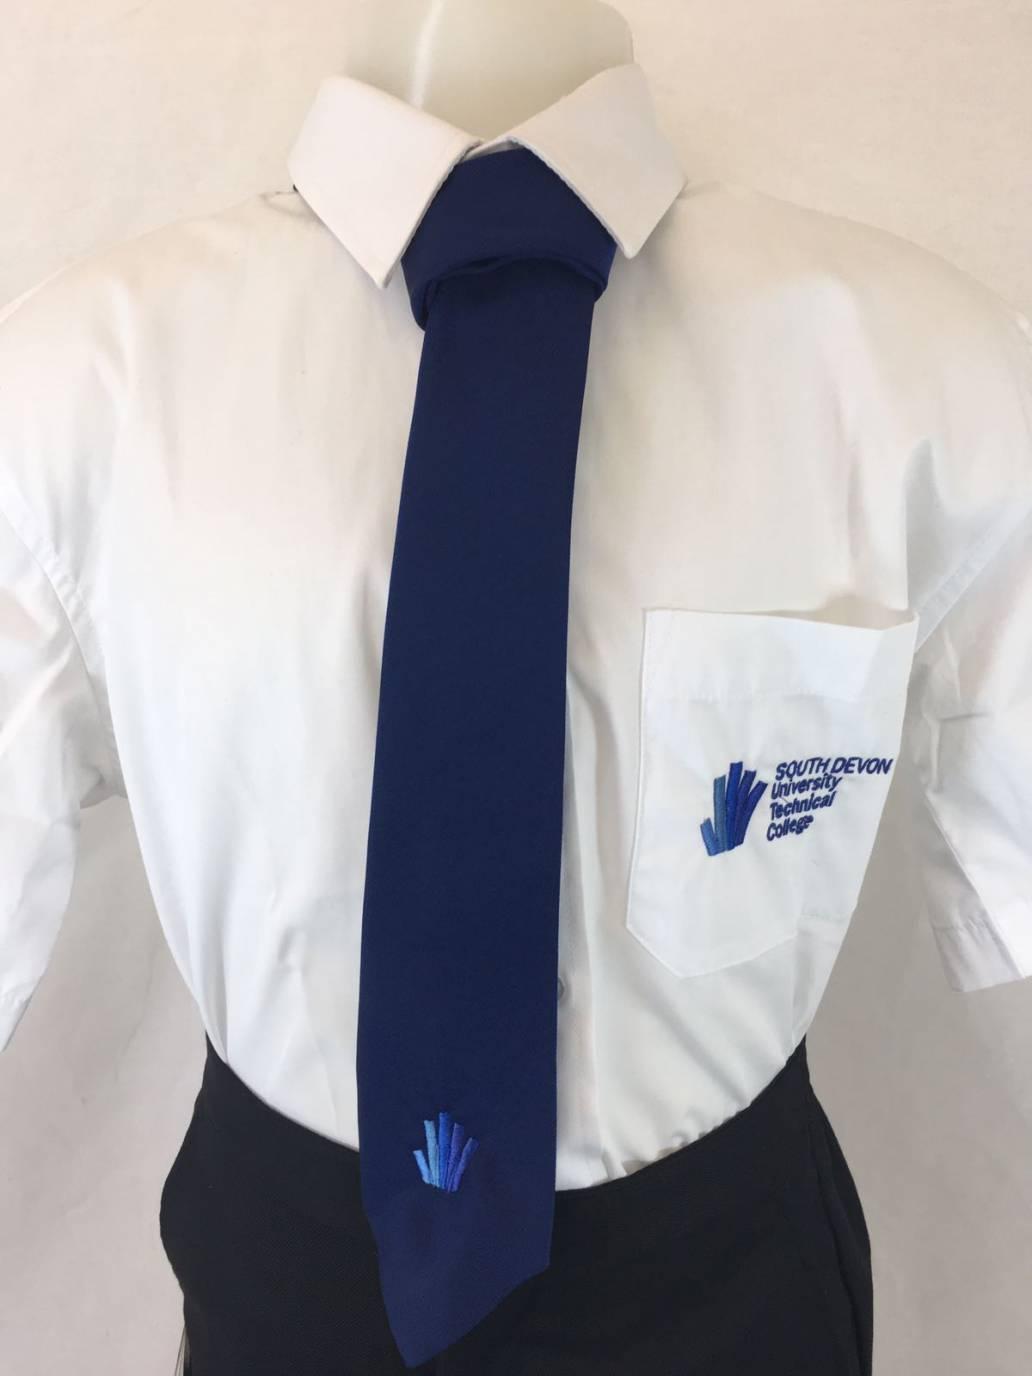 South Devon UTC  Short Sleeve Shirt